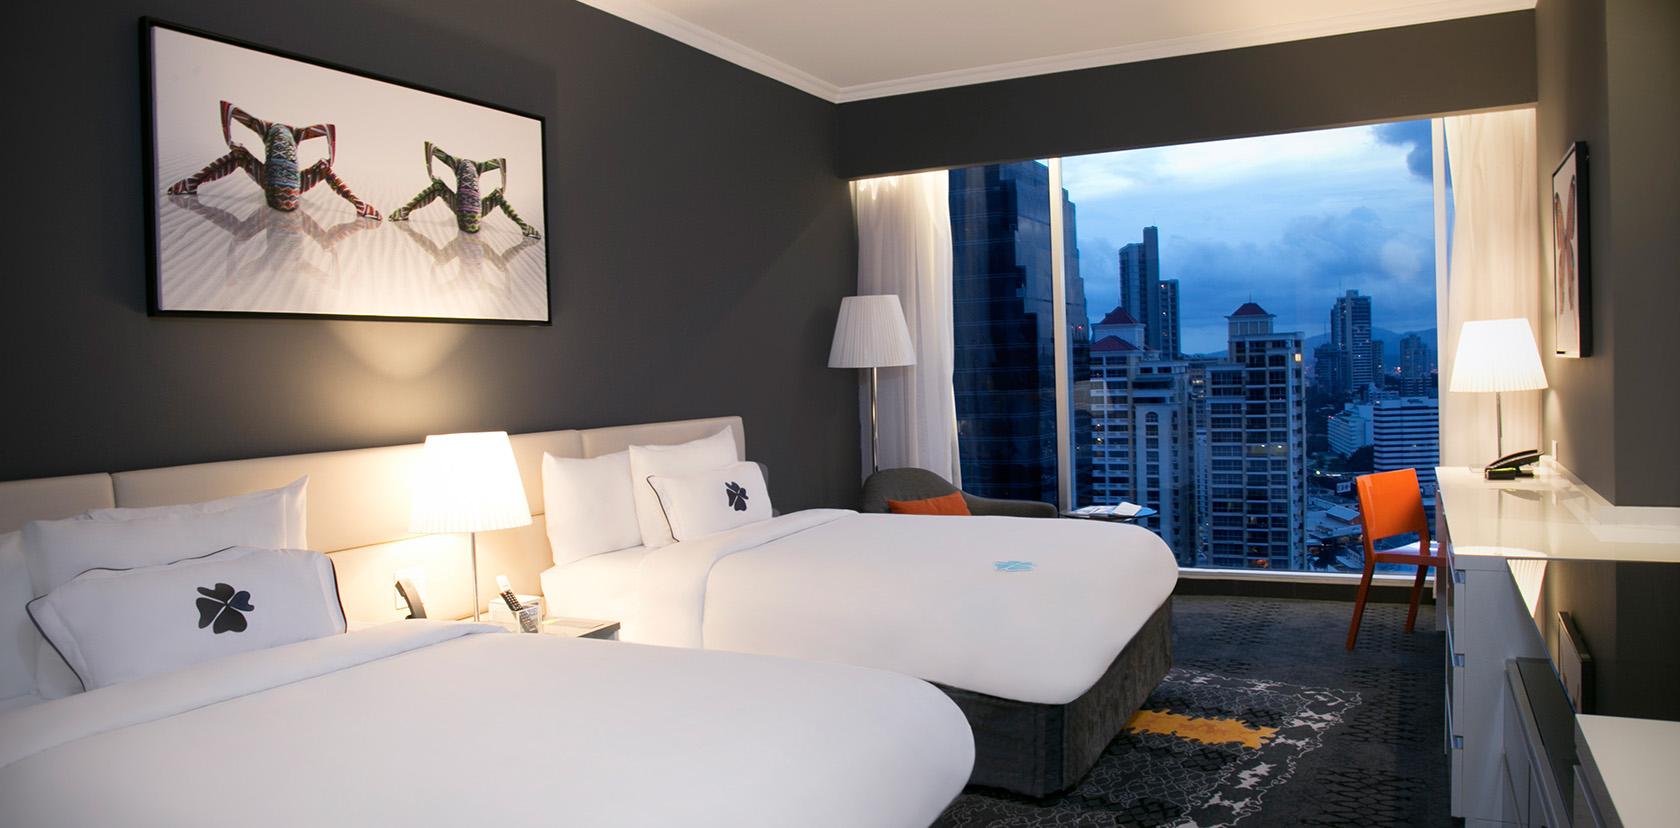 Panama hotel